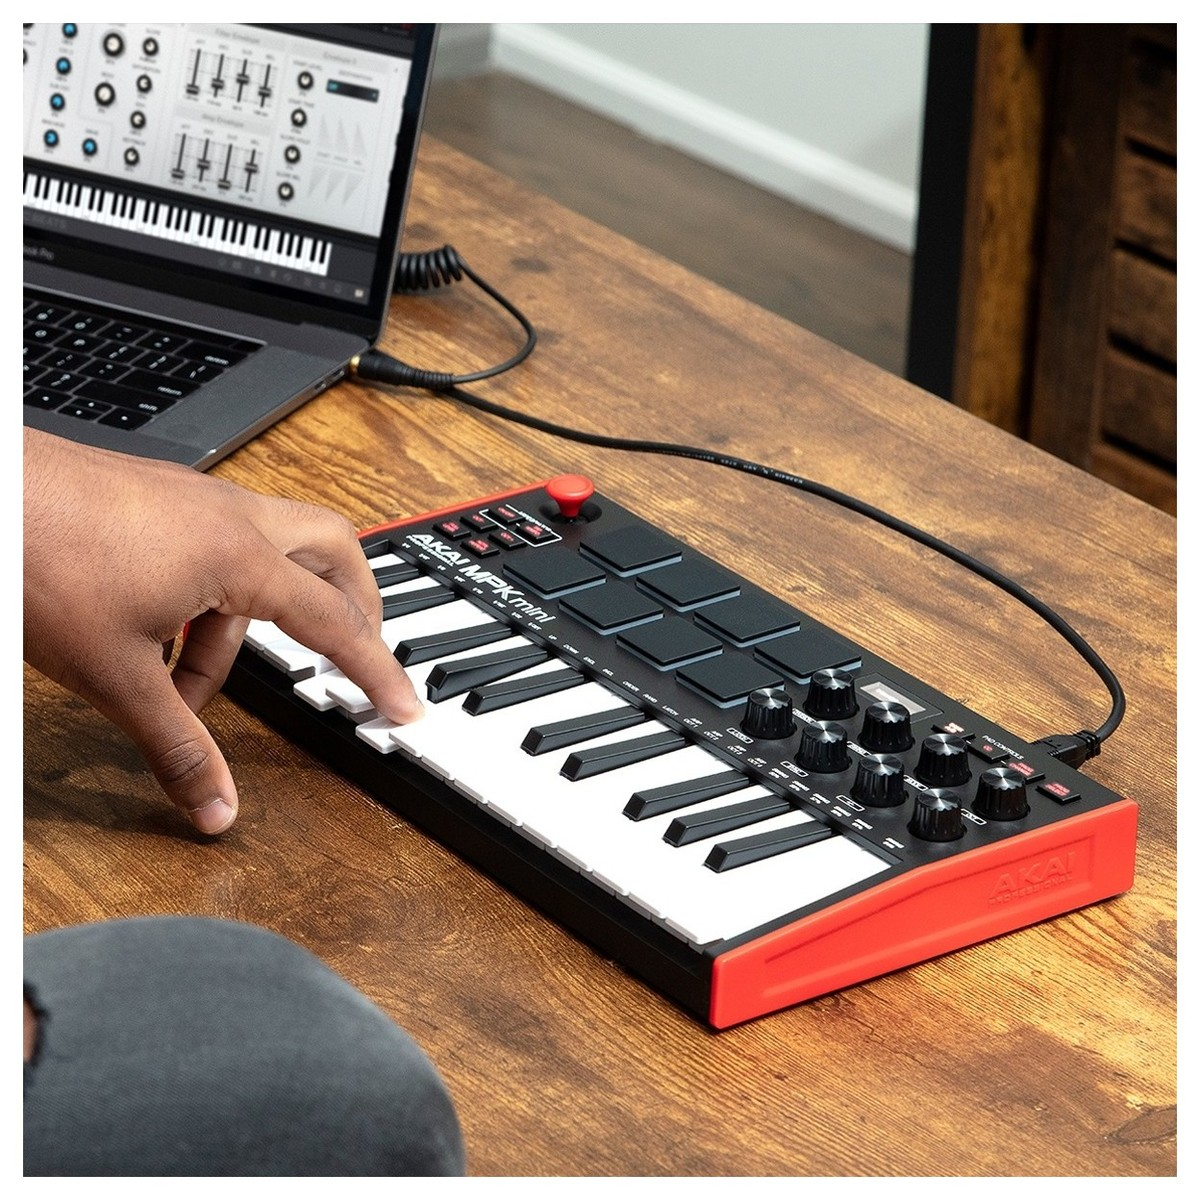 Akai Professional MPK Mini MK3 Laptop Production Keyboard